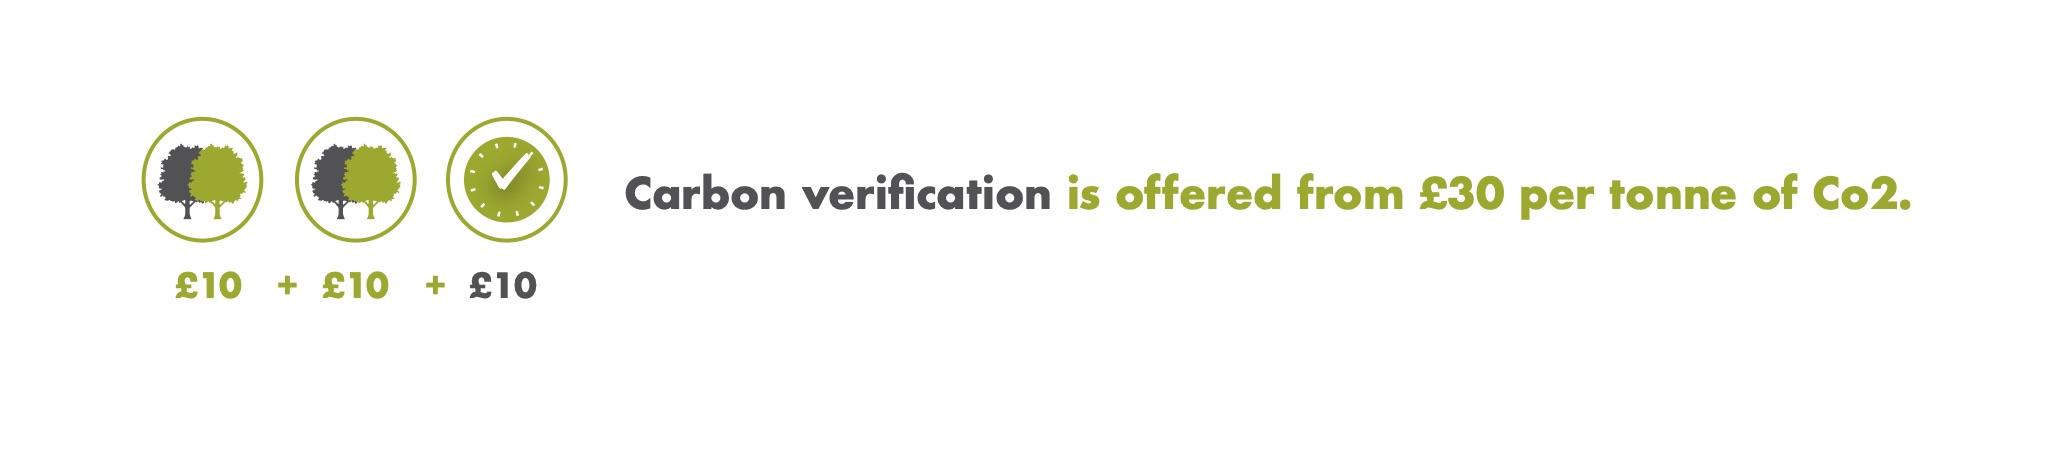 Verification disclaimer